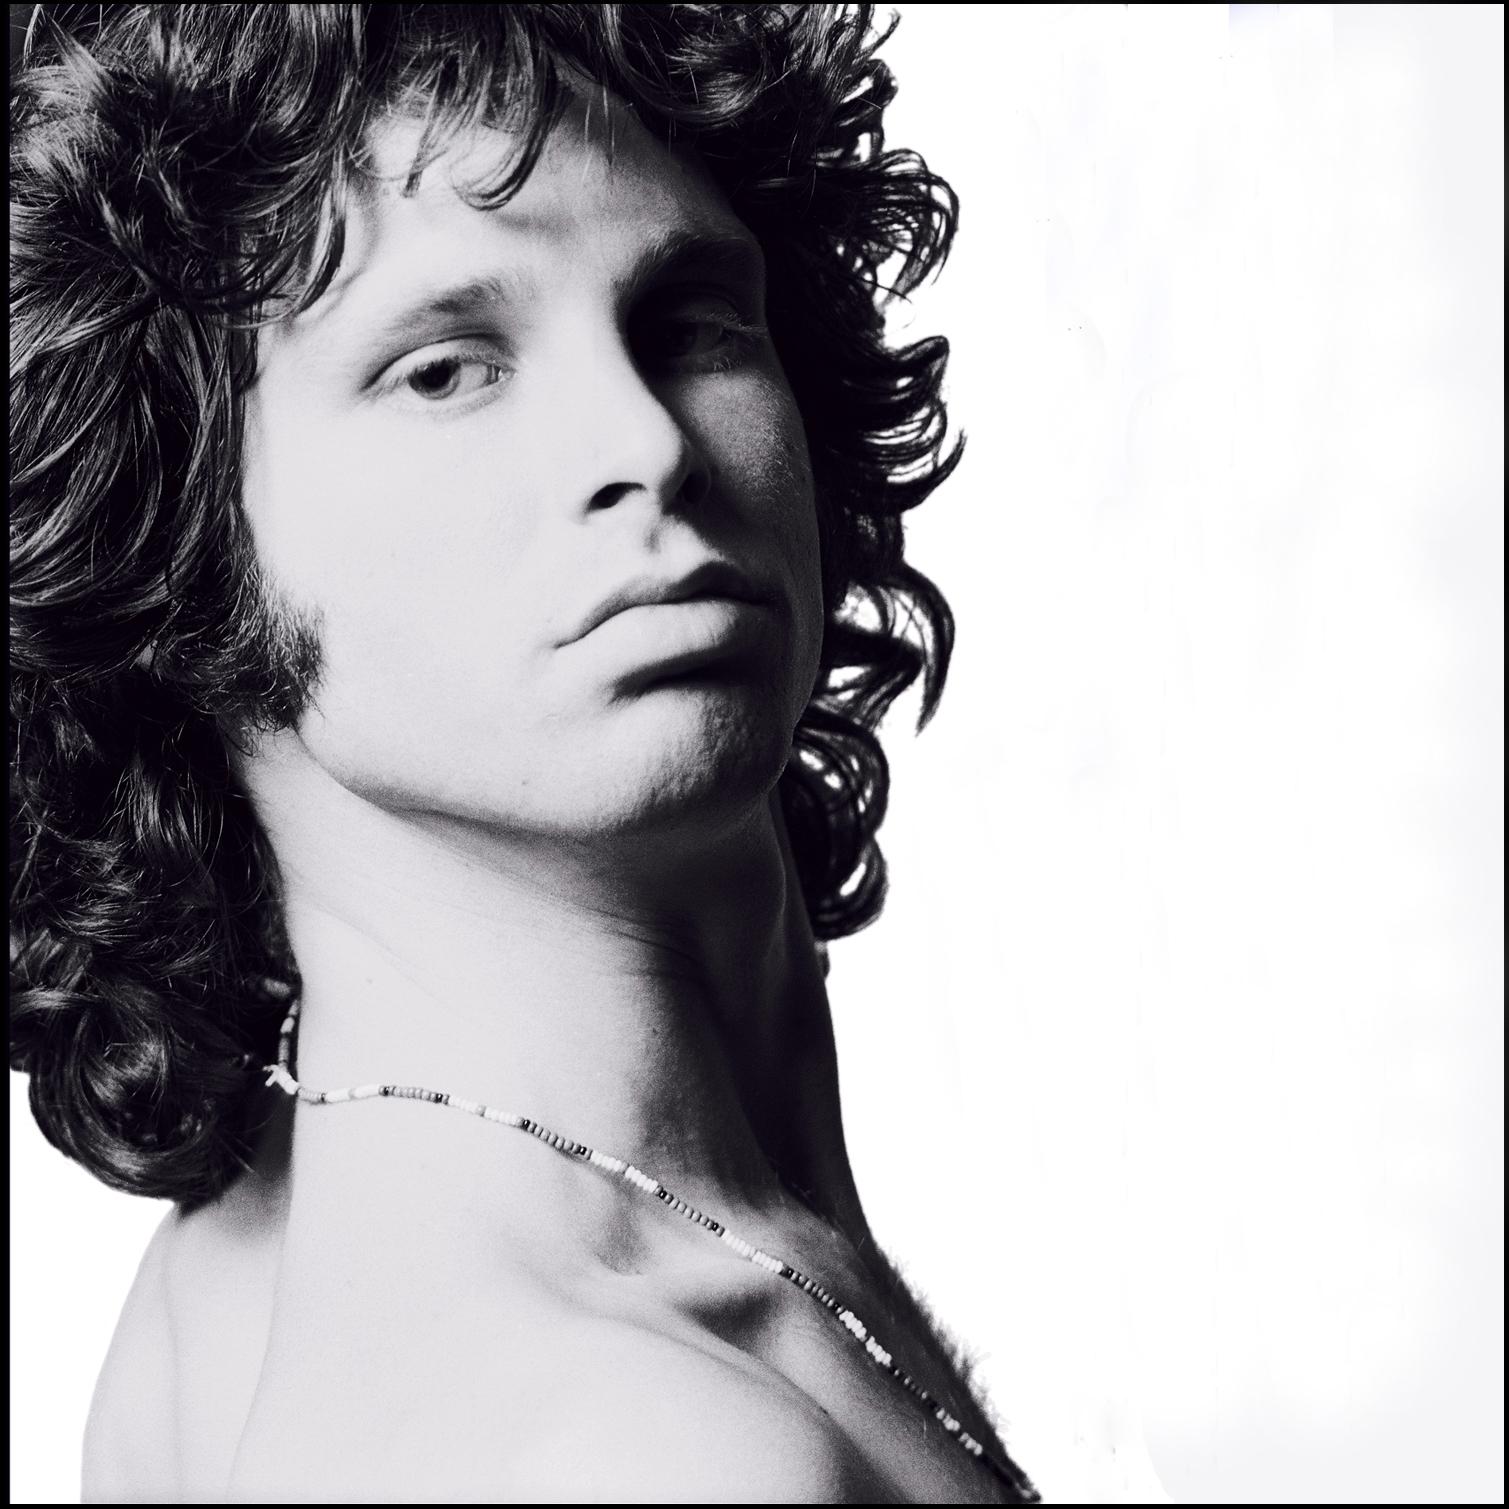 Joel Brodsky: Jim Morrison, The Sniff – Snap Galleries Limited